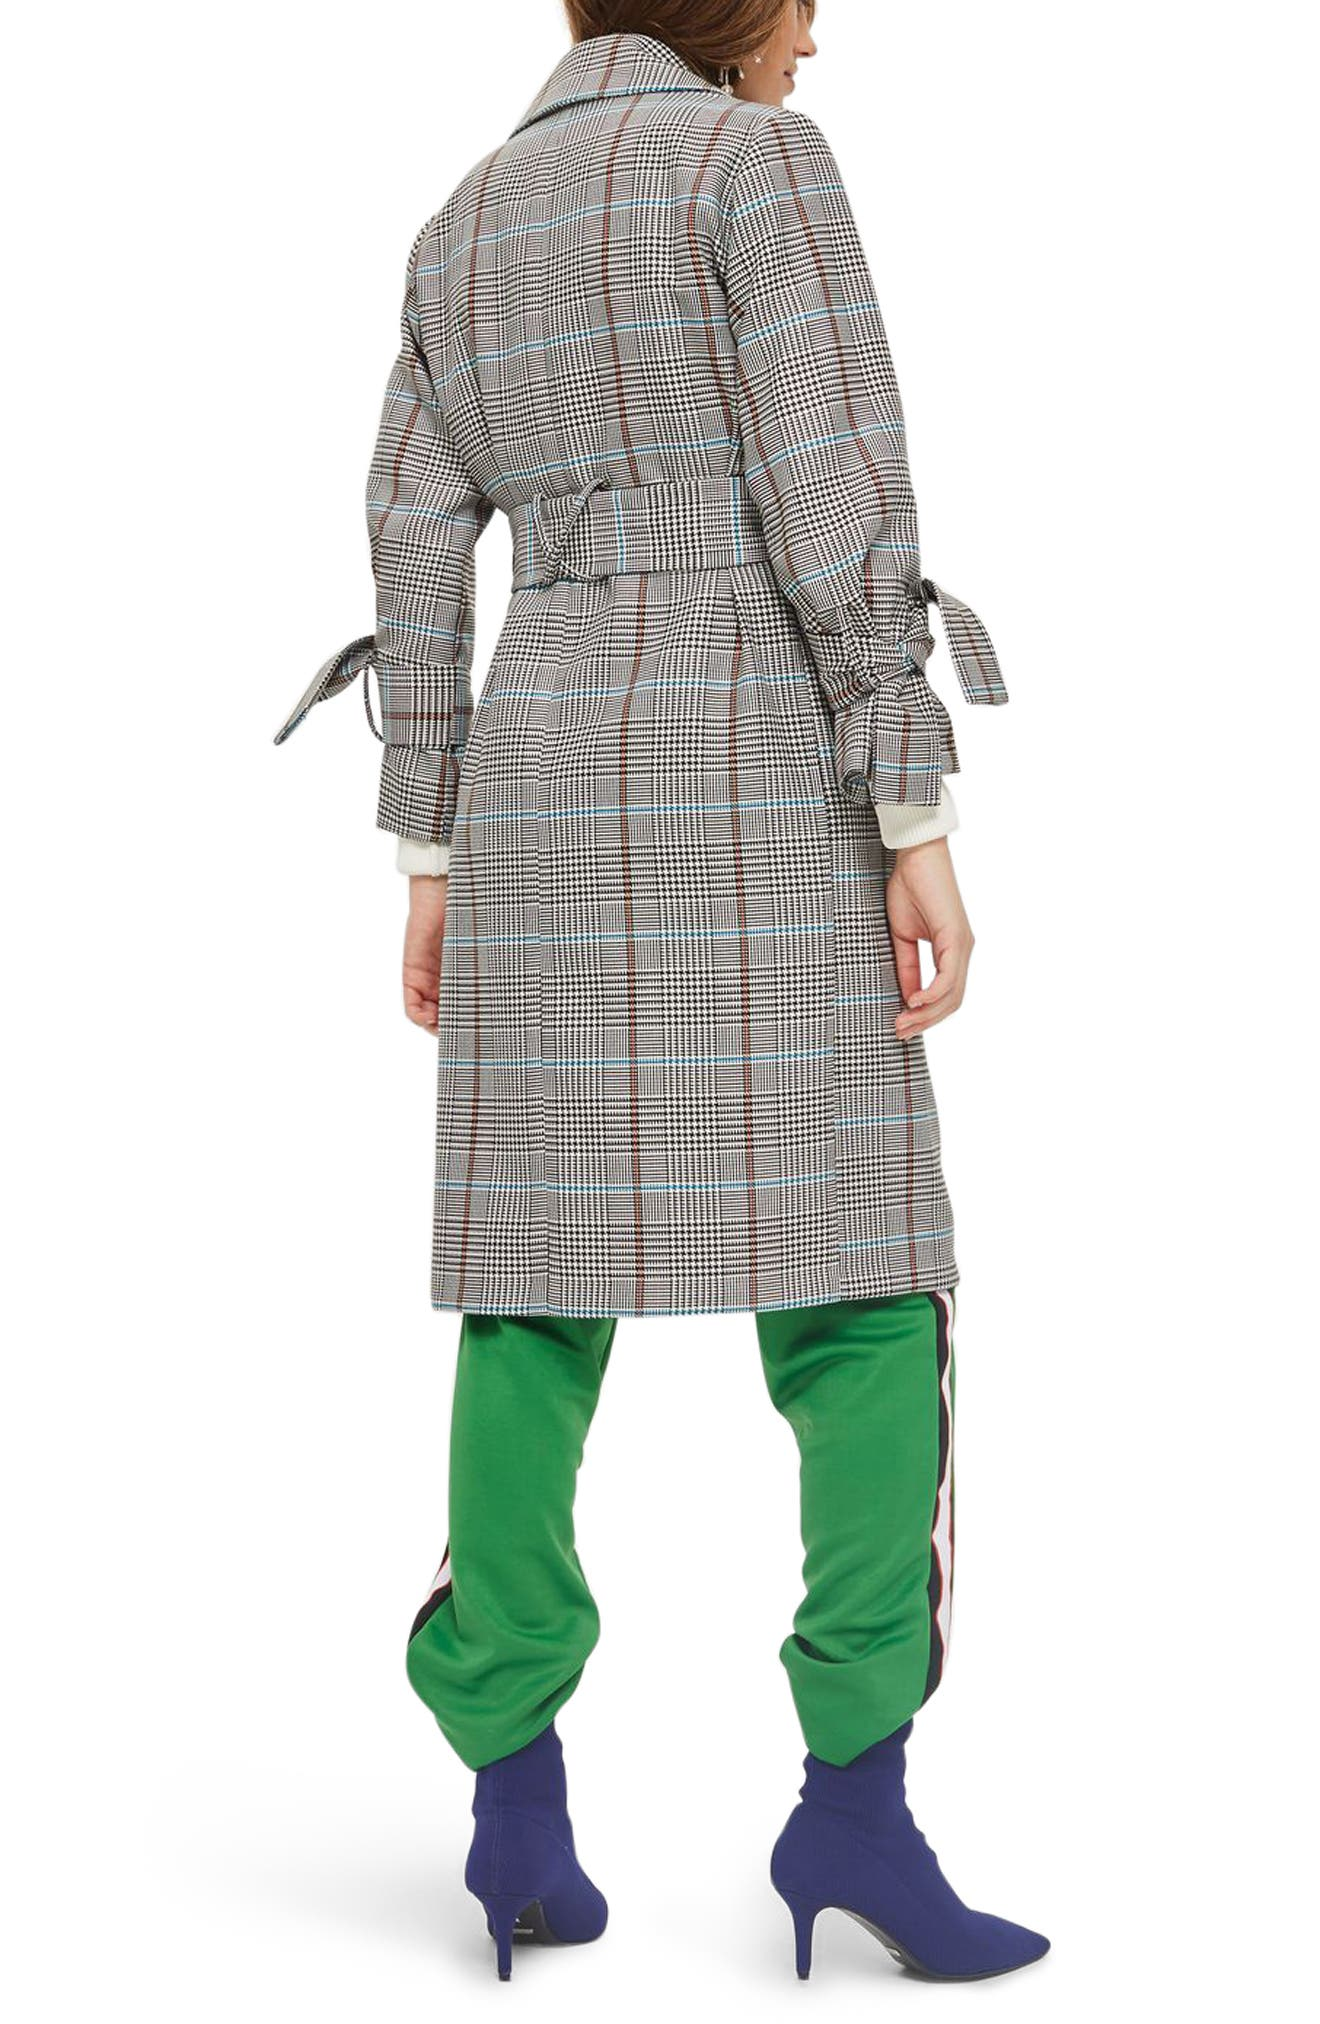 TOPSHOP,                             Check Belted Coat,                             Alternate thumbnail 2, color,                             001